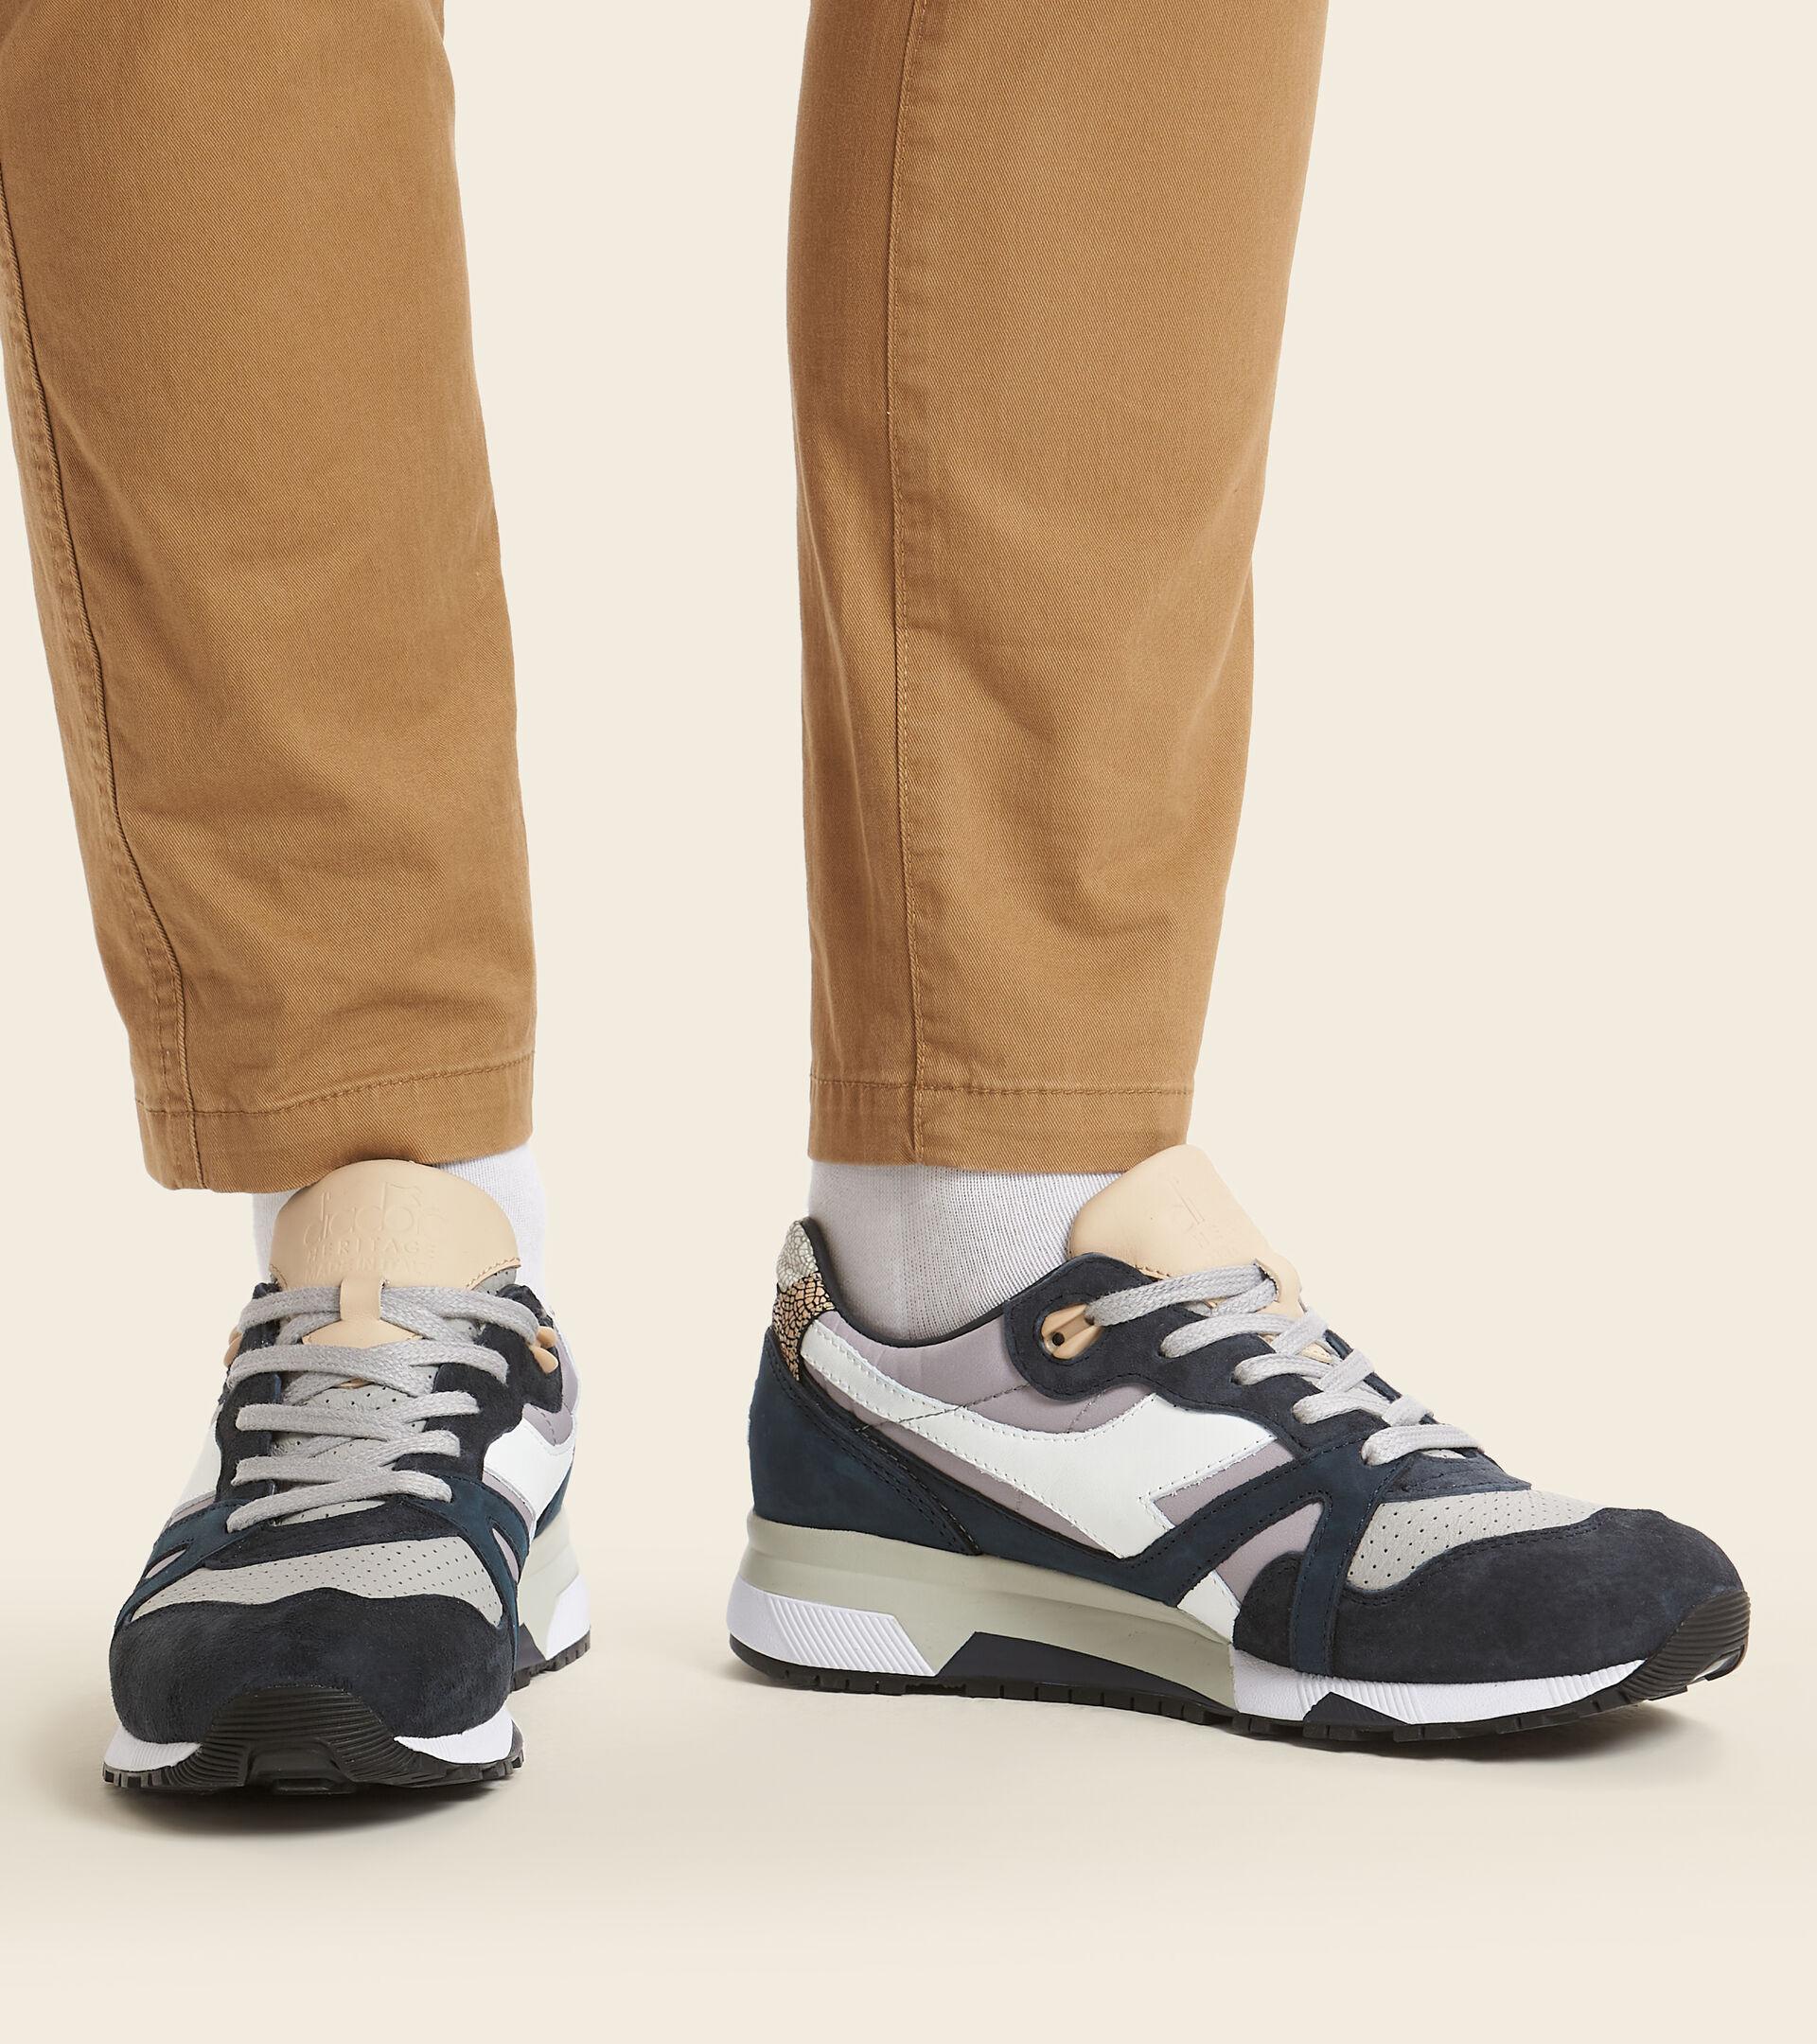 Heritage-Schuh Made in Italy - Herren N9000 ITALIA TAUBEGRAU - Diadora